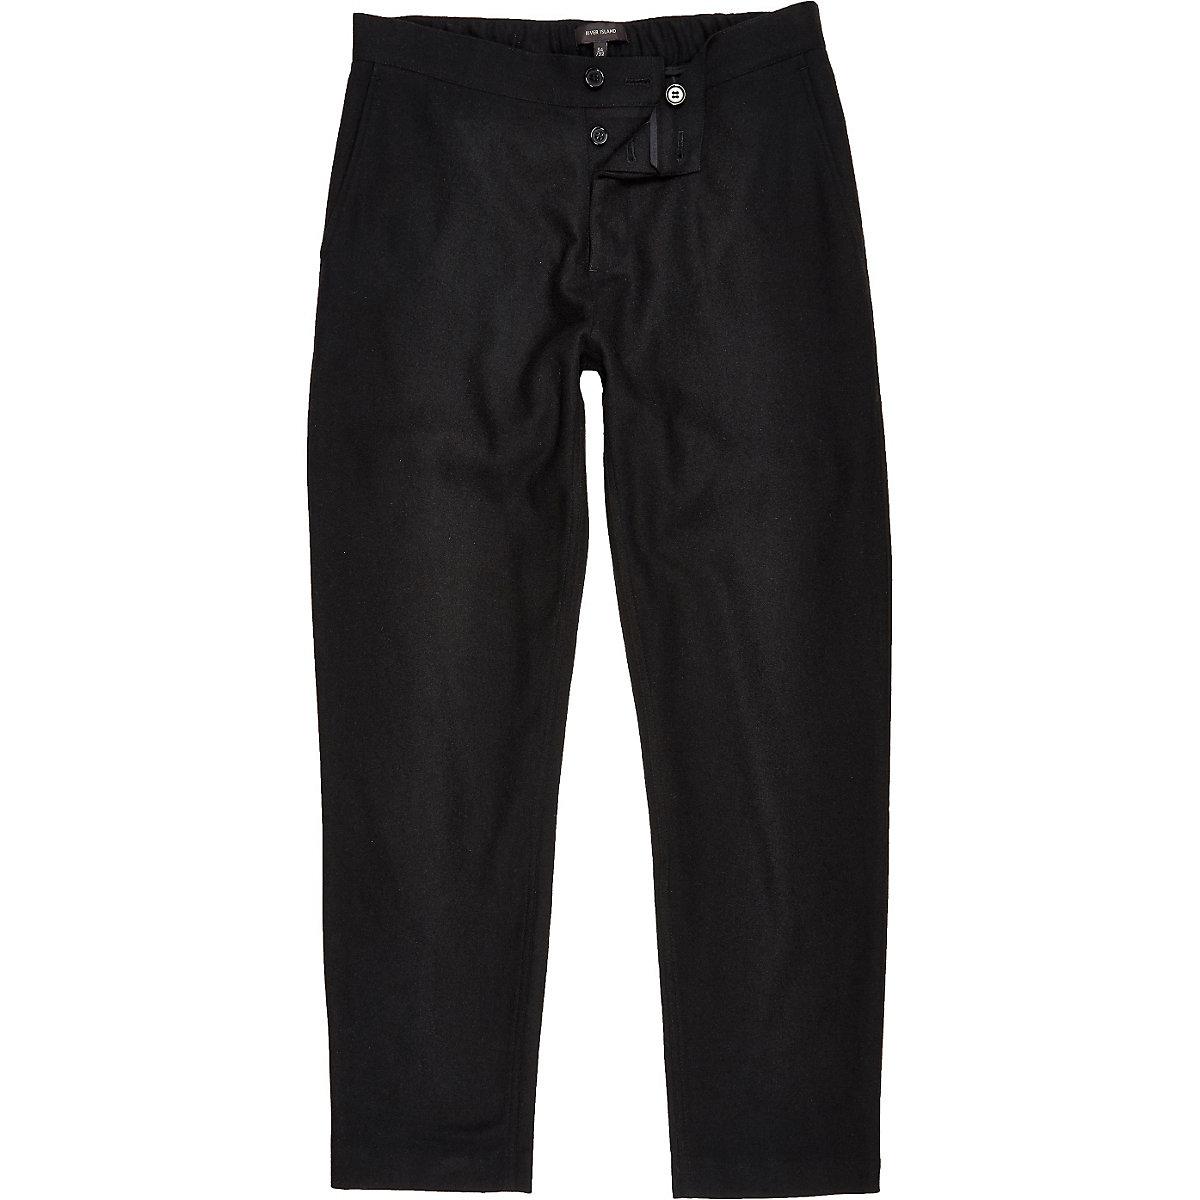 Black wool-blend jogger trousers